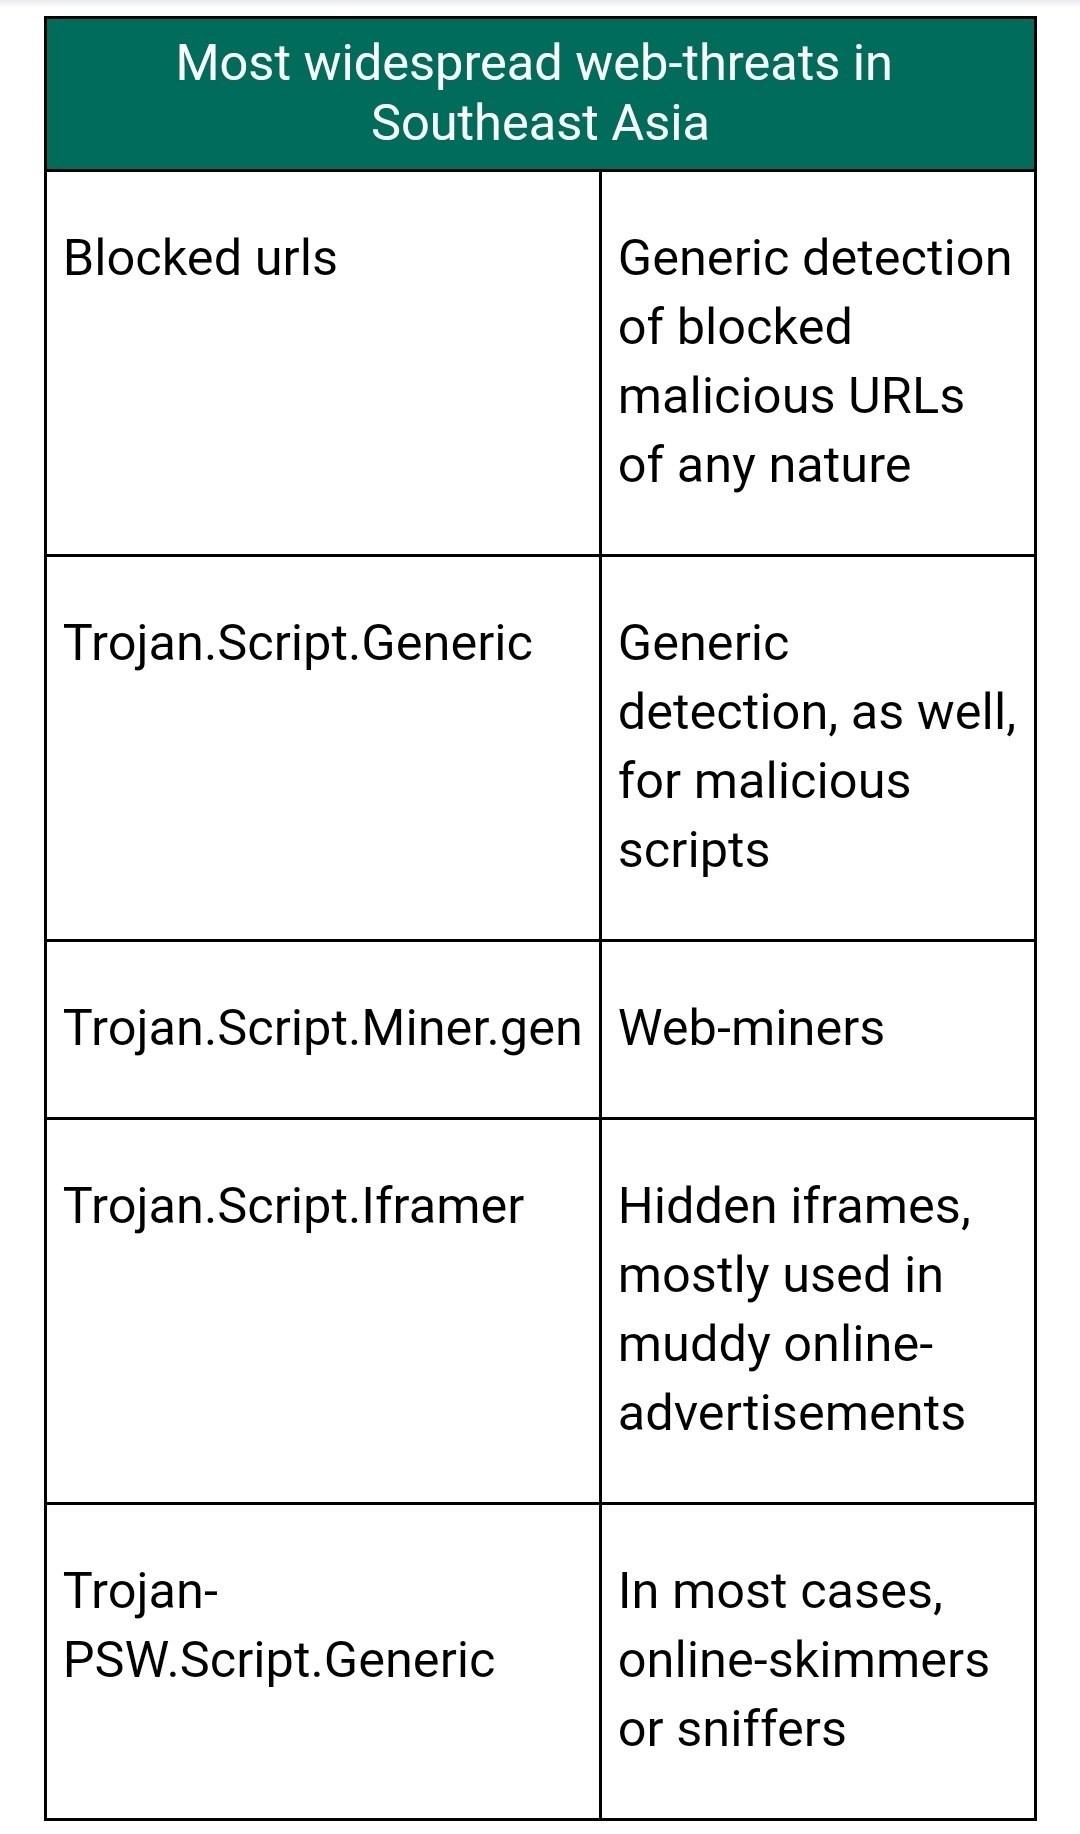 Kaspersky, PHL, global, 4th, cybersecurity, web threats, malware